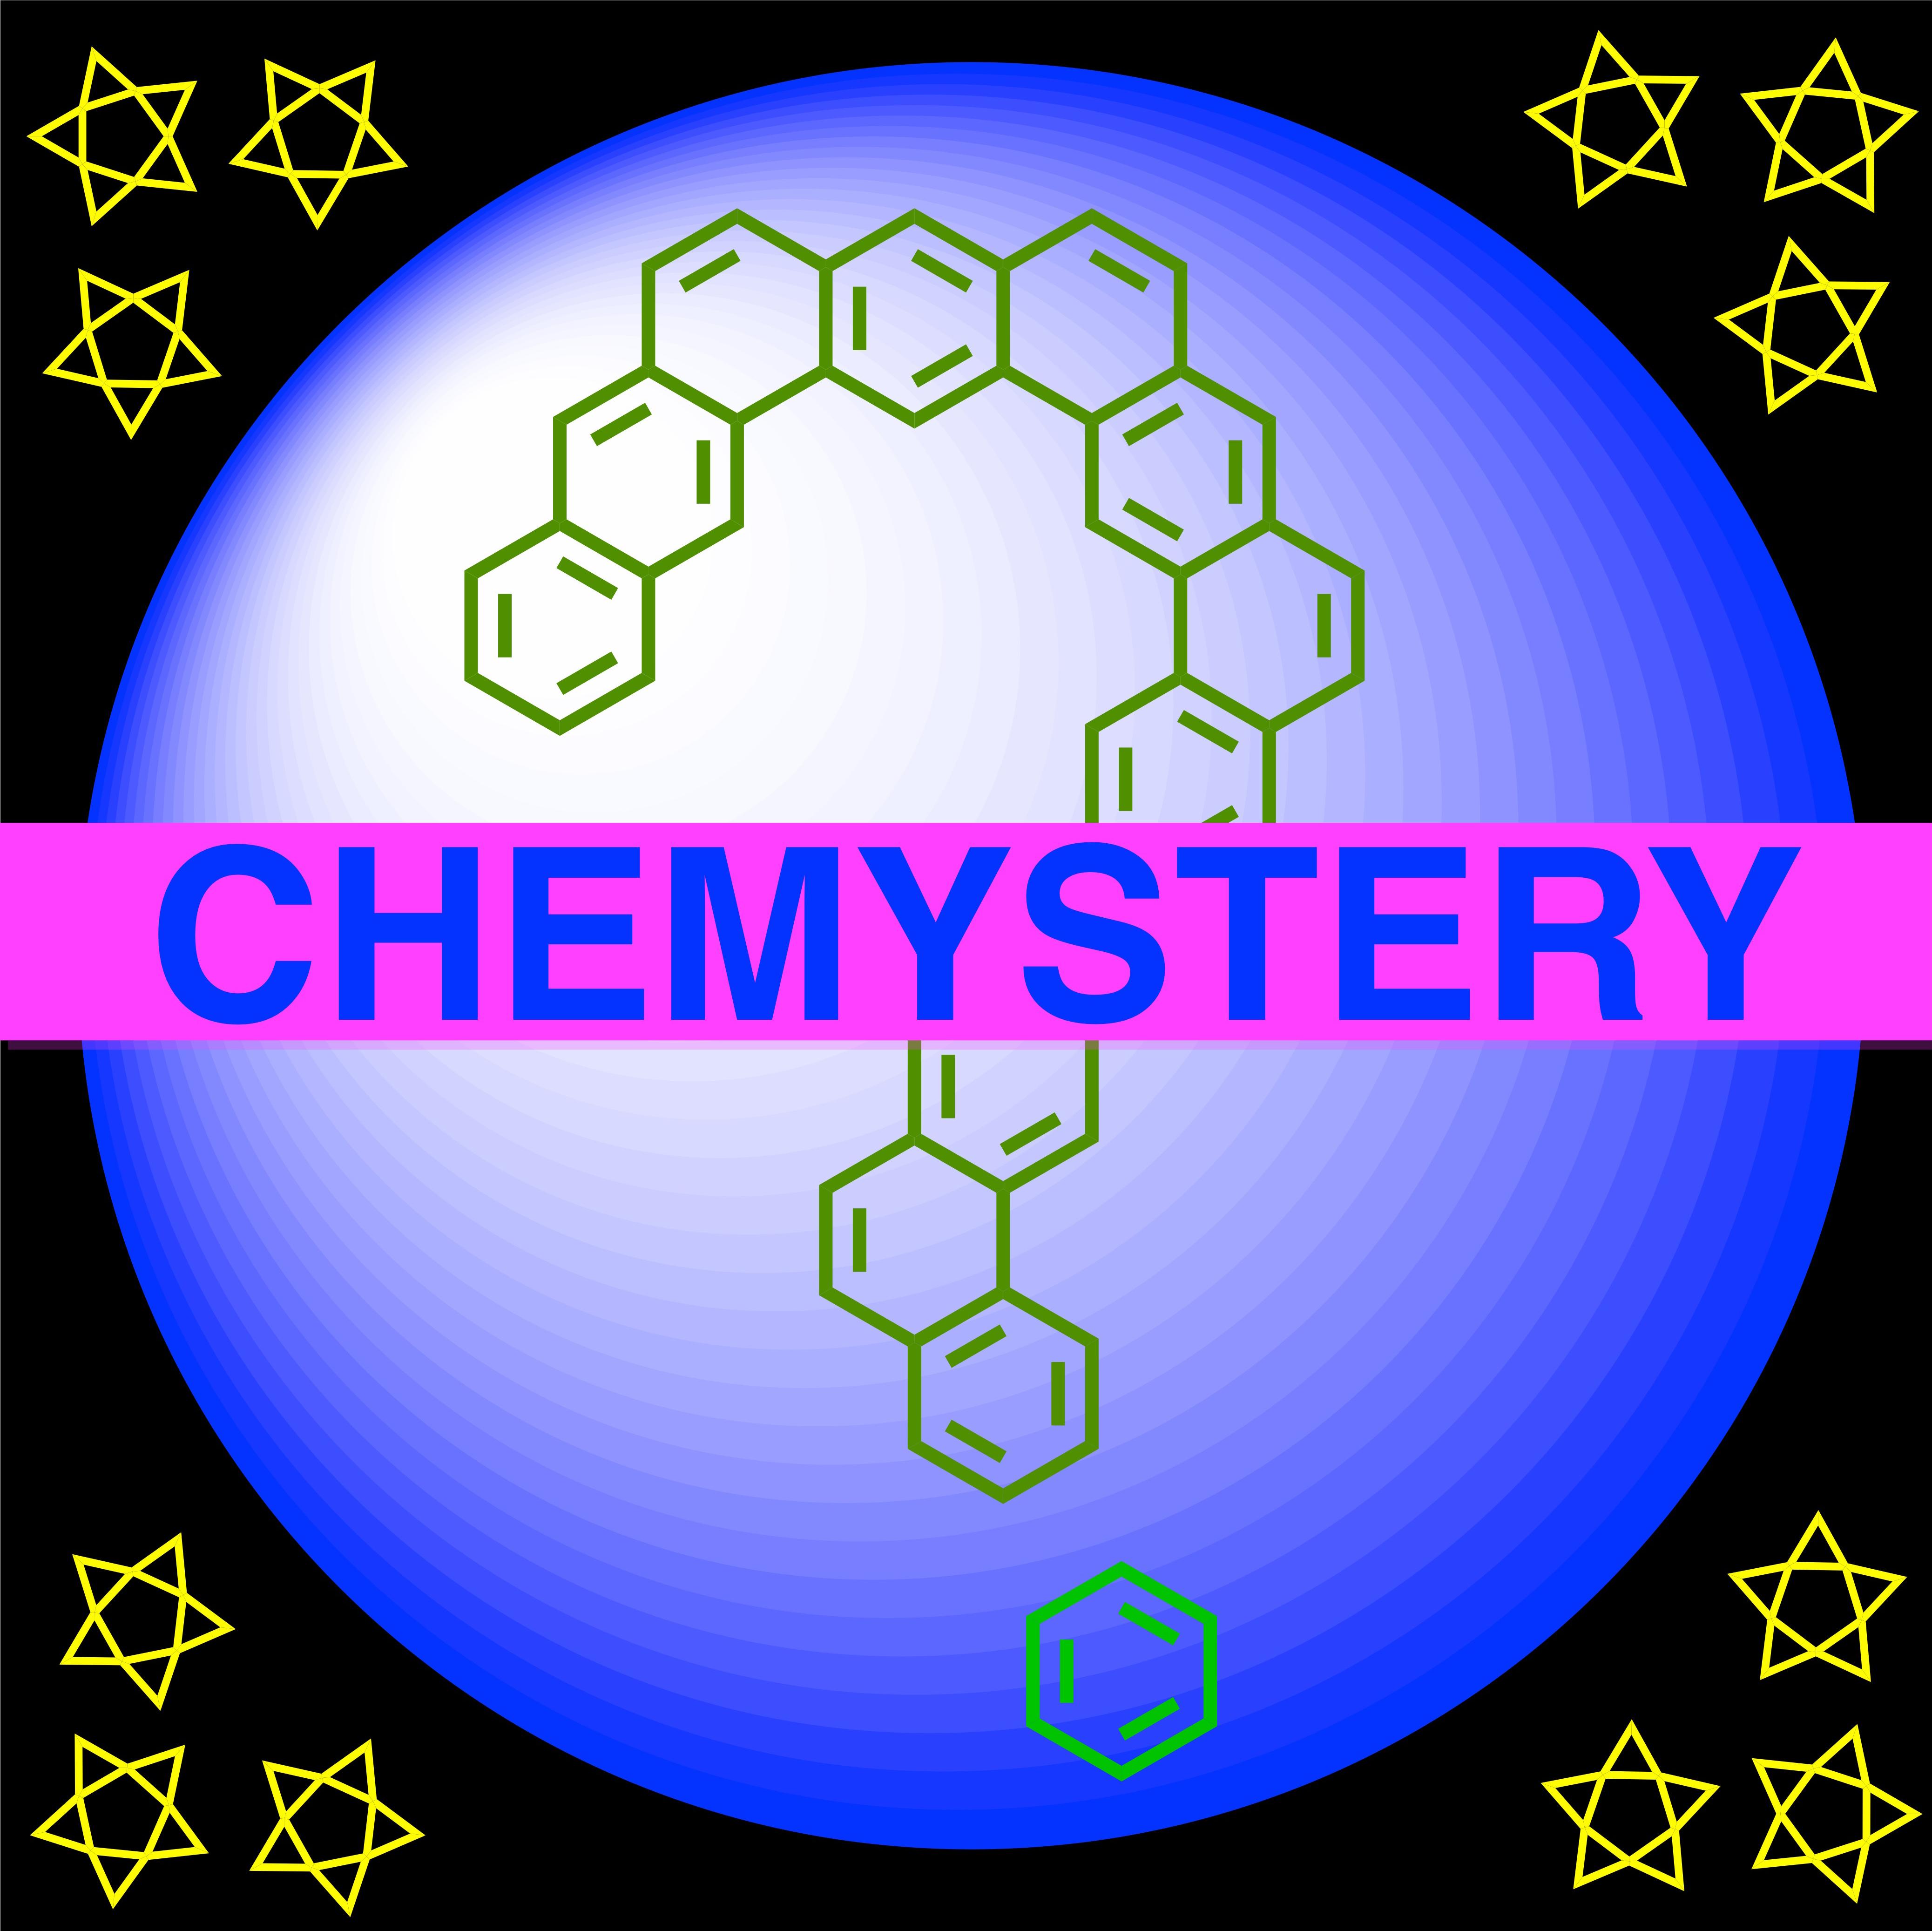 Chemystery